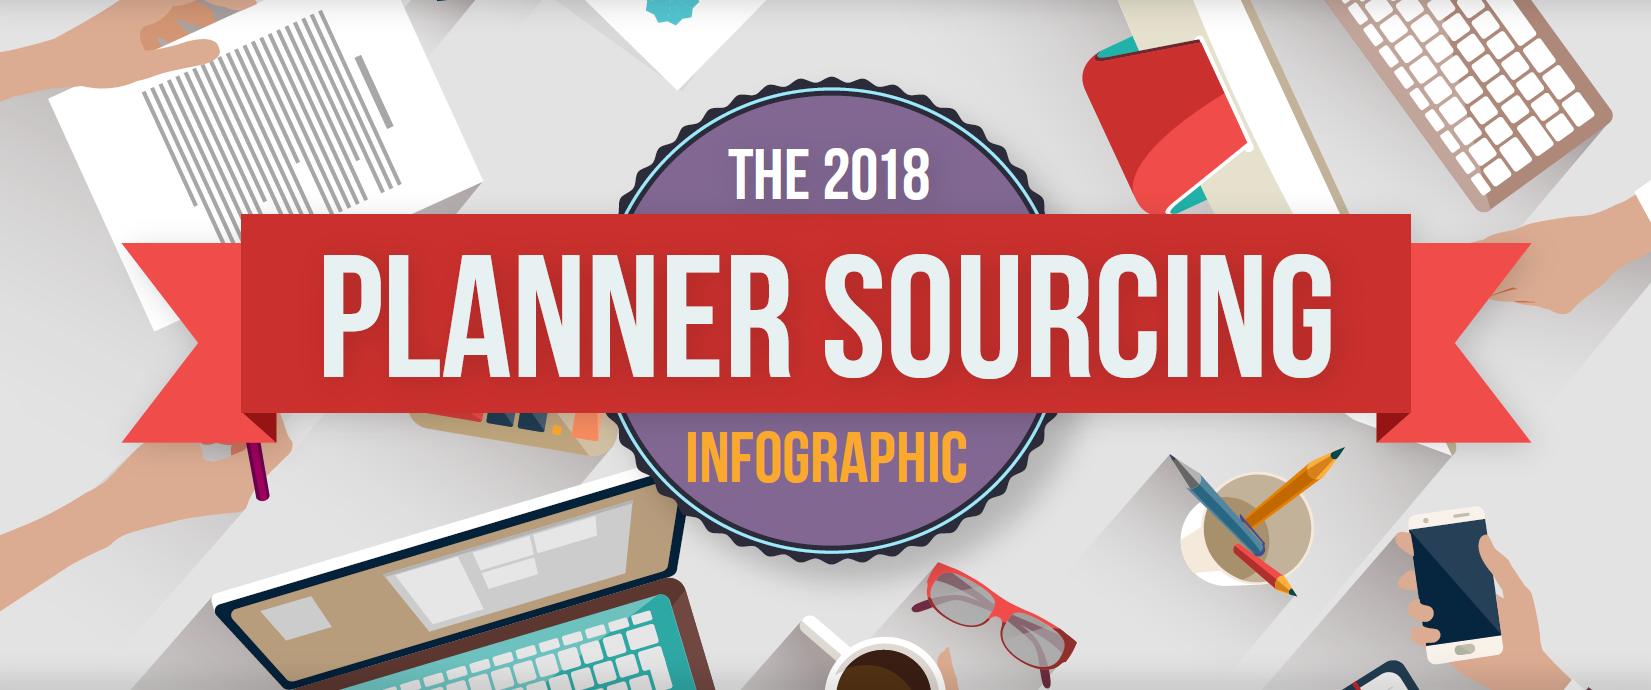 2018-Planner-Sourcing-Header-1